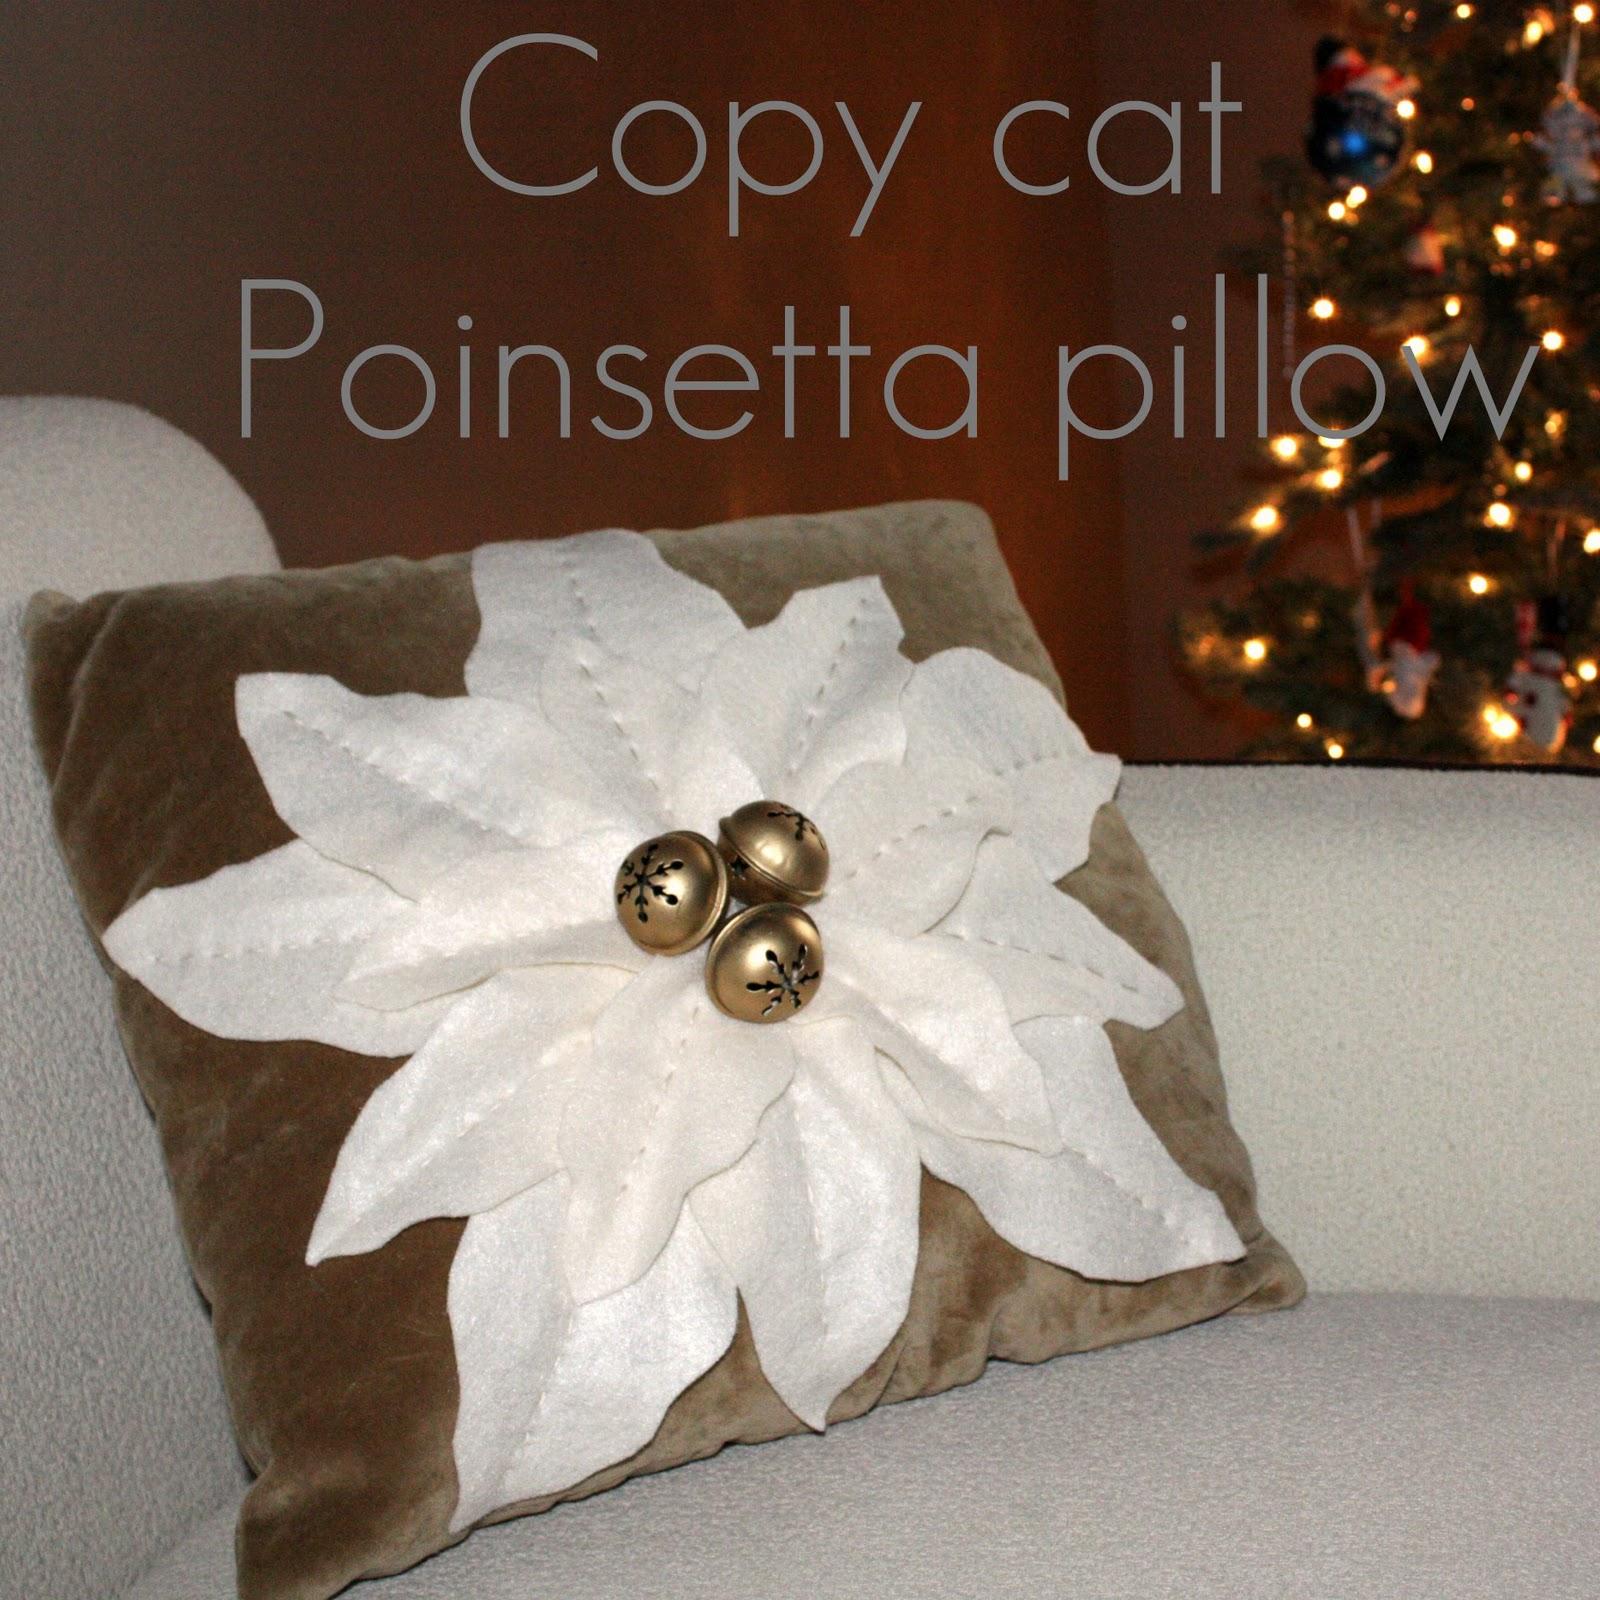 As You Sew So Shall You Rip Poinsettia Pillow Tutorial